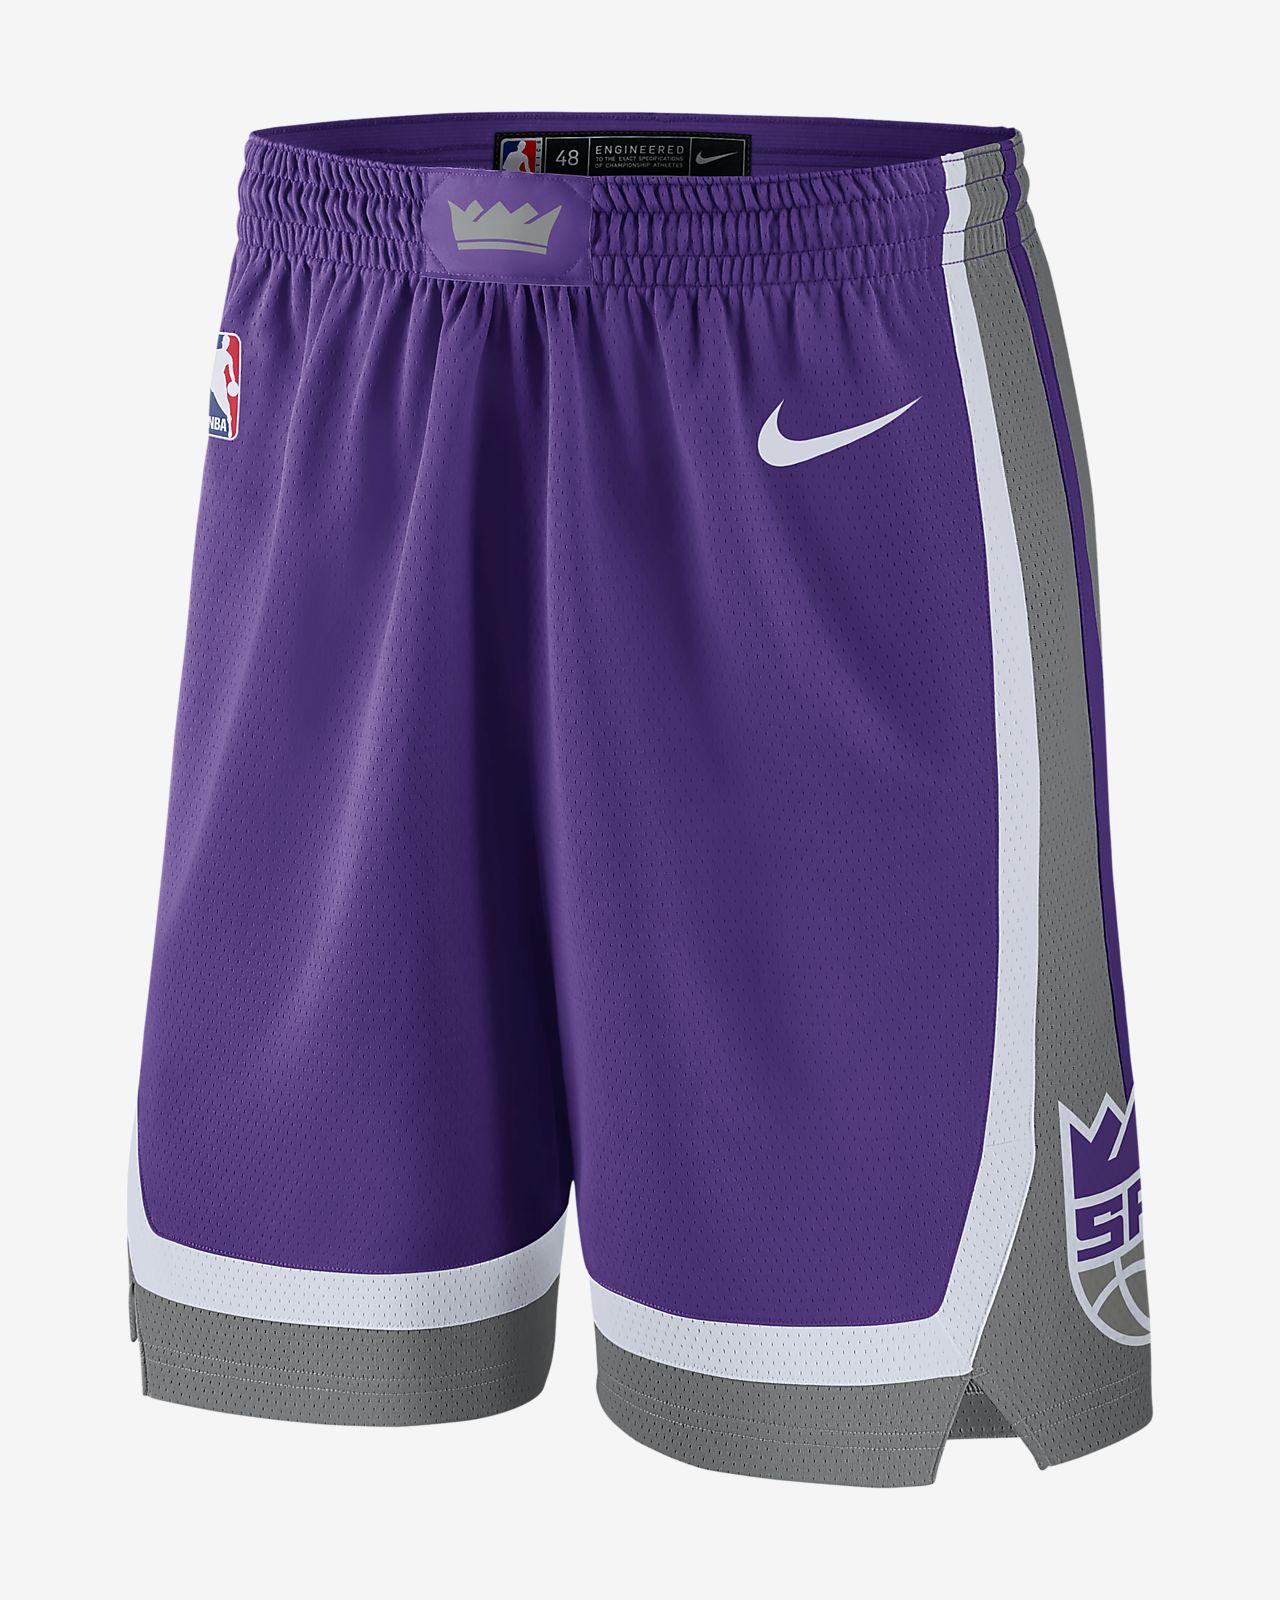 Sacramento Kings Icon Edition Swingman Nike NBA-shorts til mænd